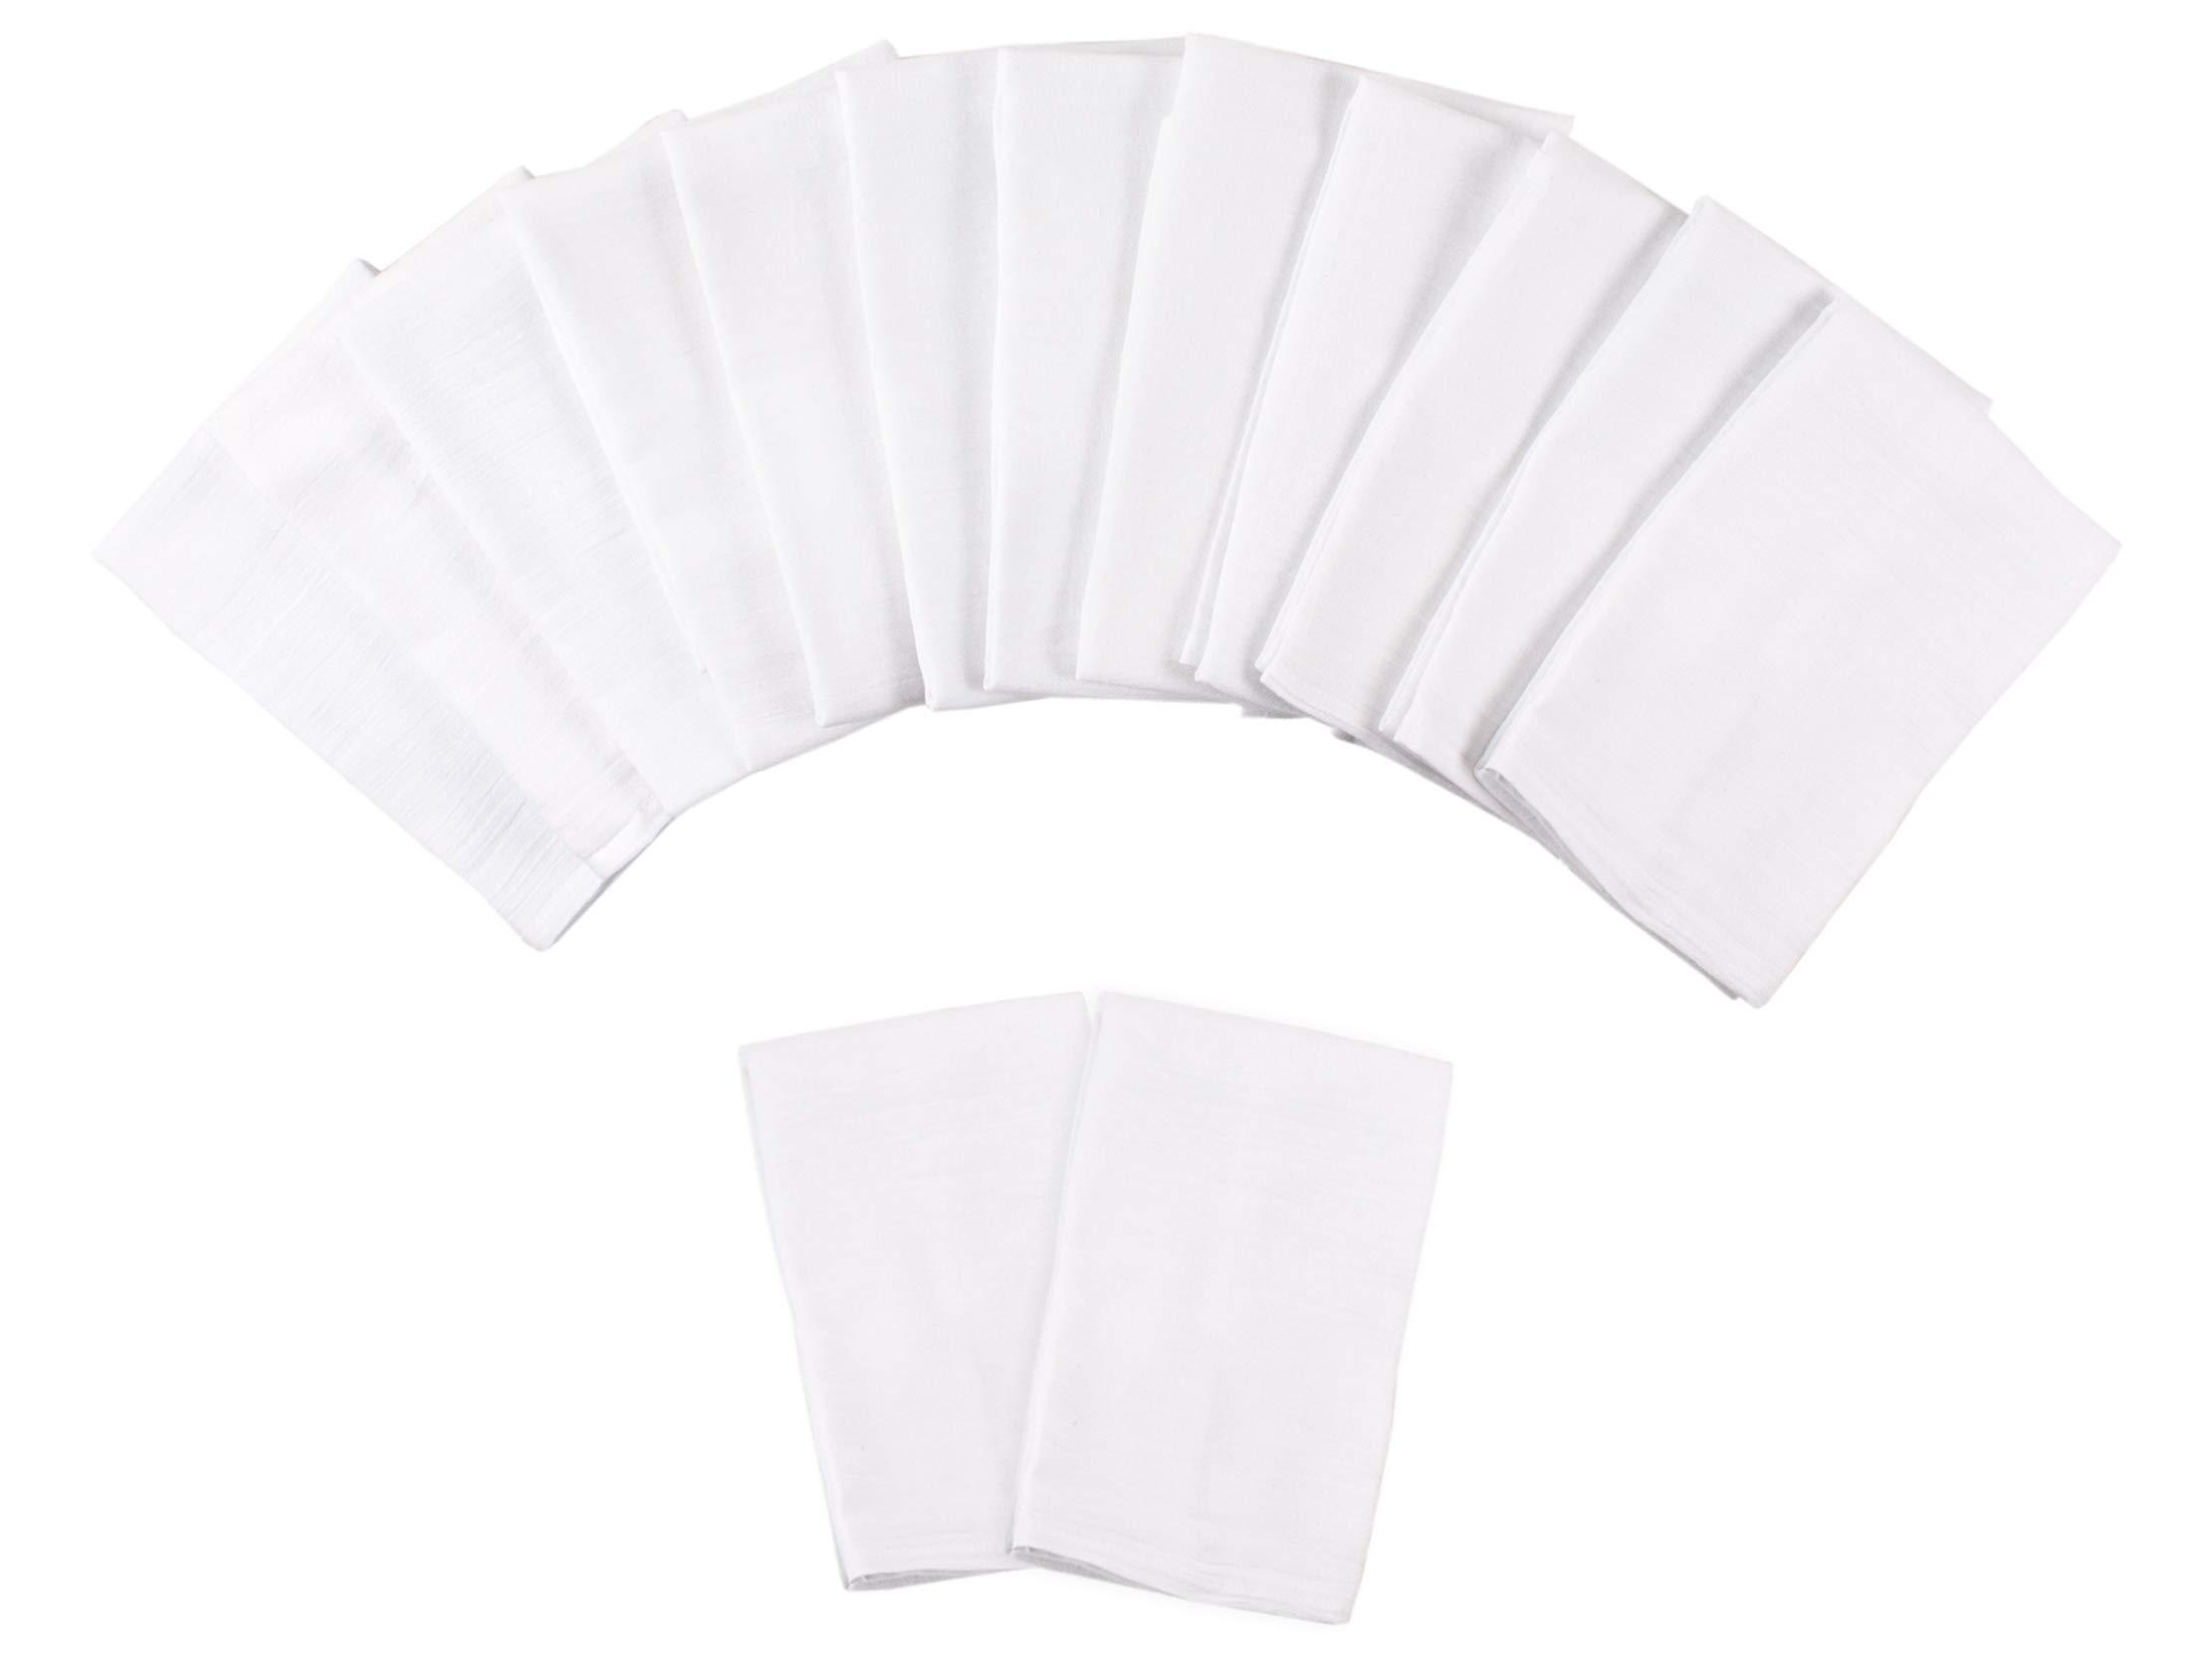 Value Basics Flour Sack Towel Set, All-Natural 100% Cotton floursack, White, 28'' x 28'', 14-Pack (2 Extra Free)